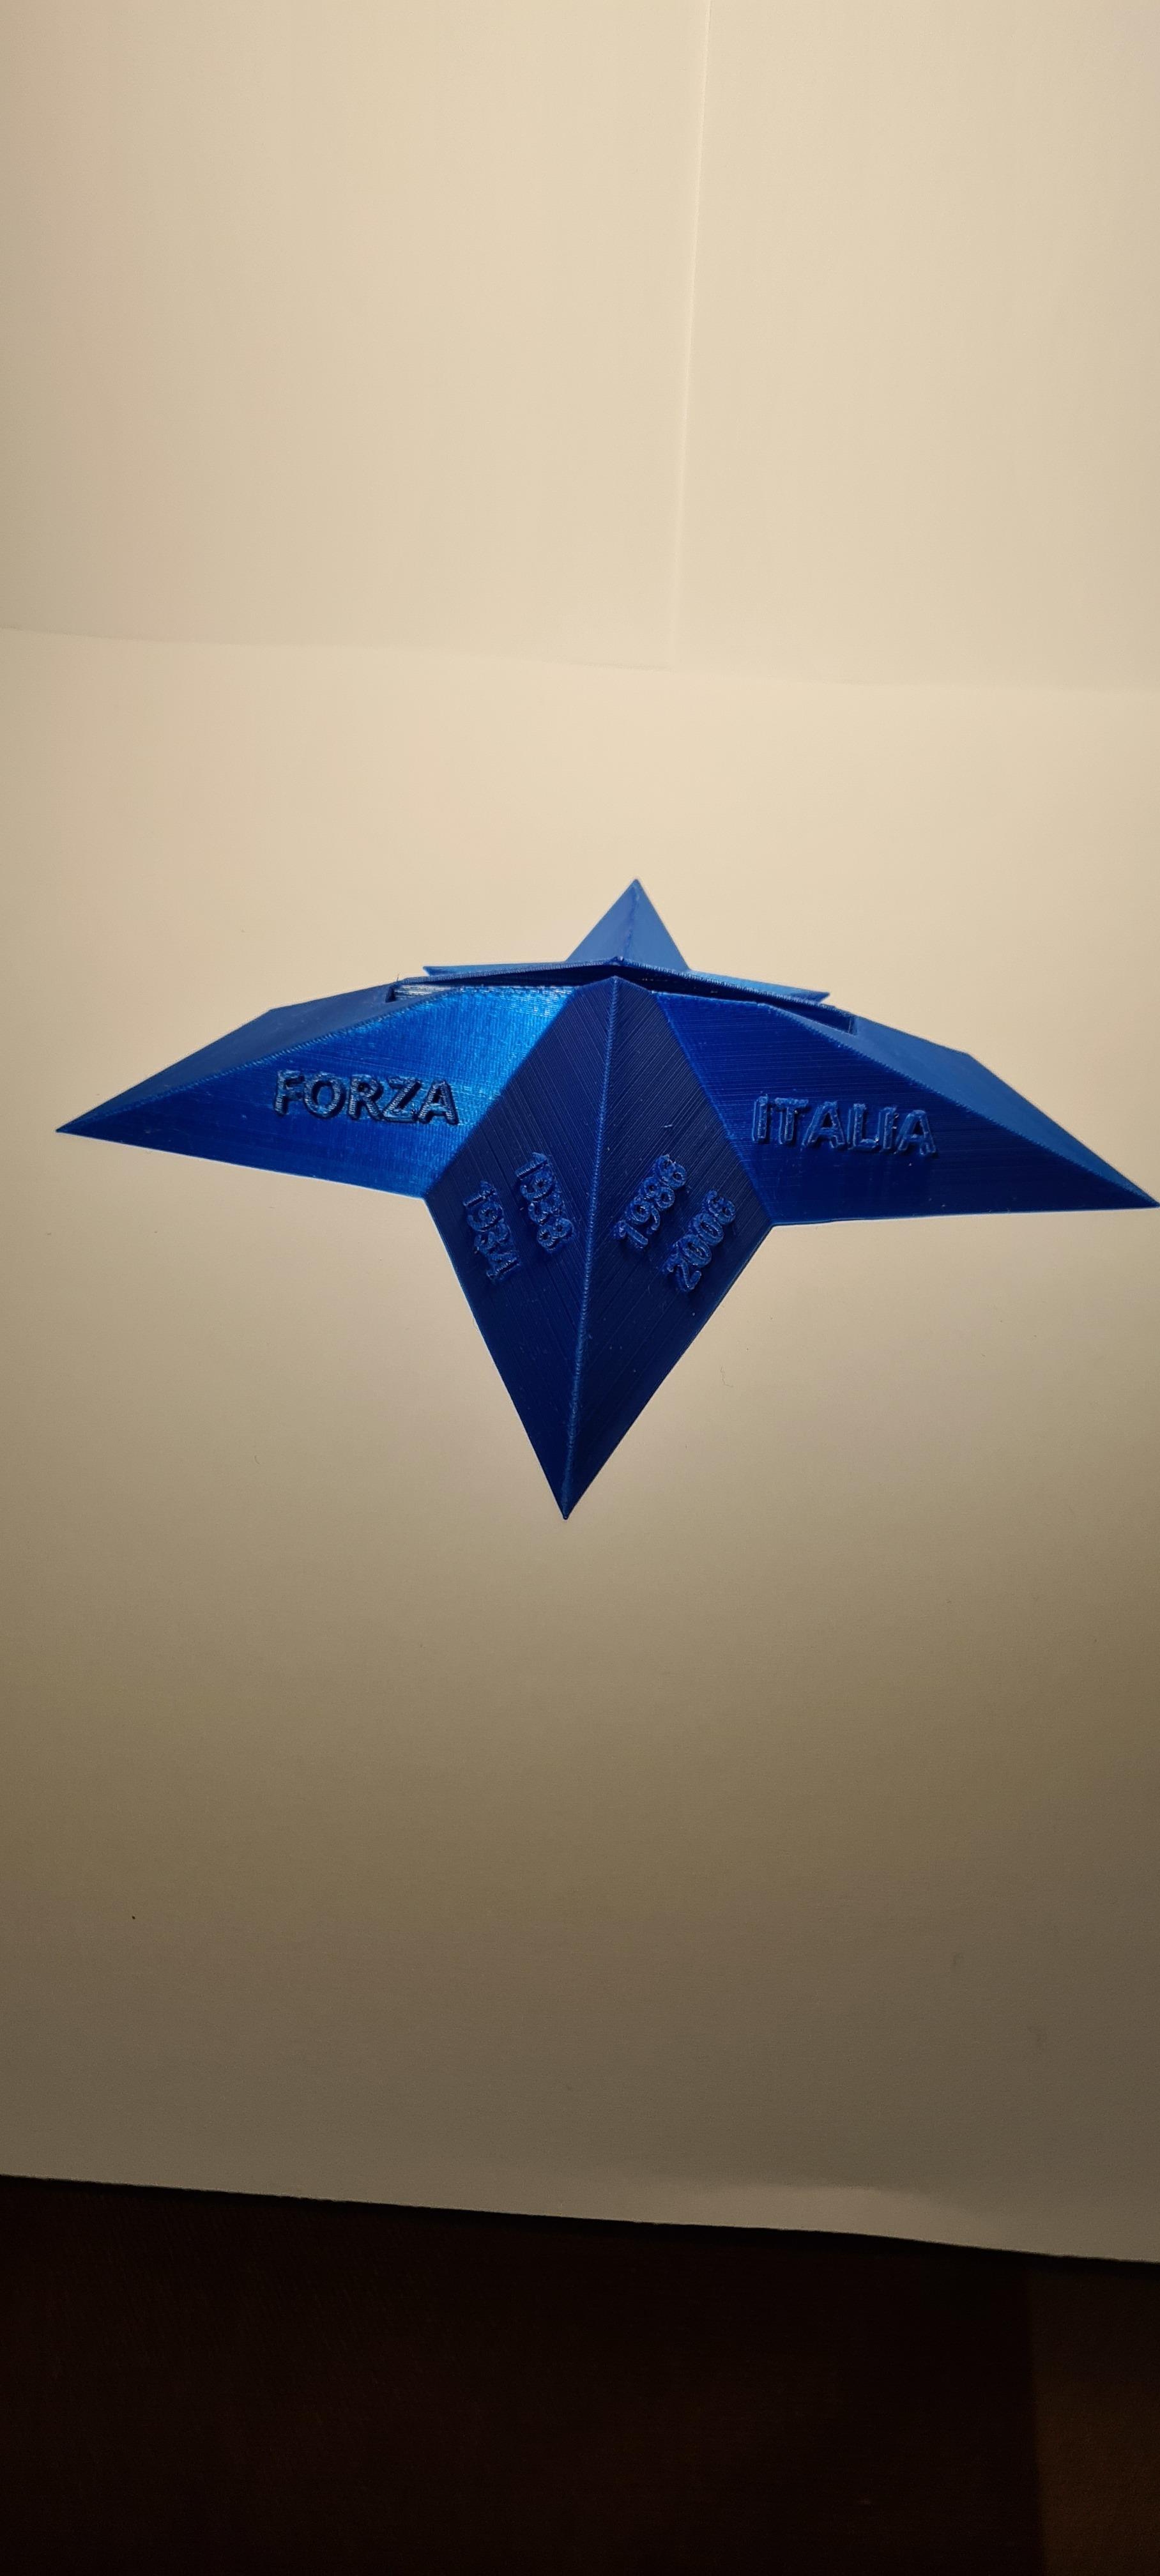 20201017_161852.jpg Télécharger fichier STL Logo italia figc • Objet imprimable en 3D, zimatera